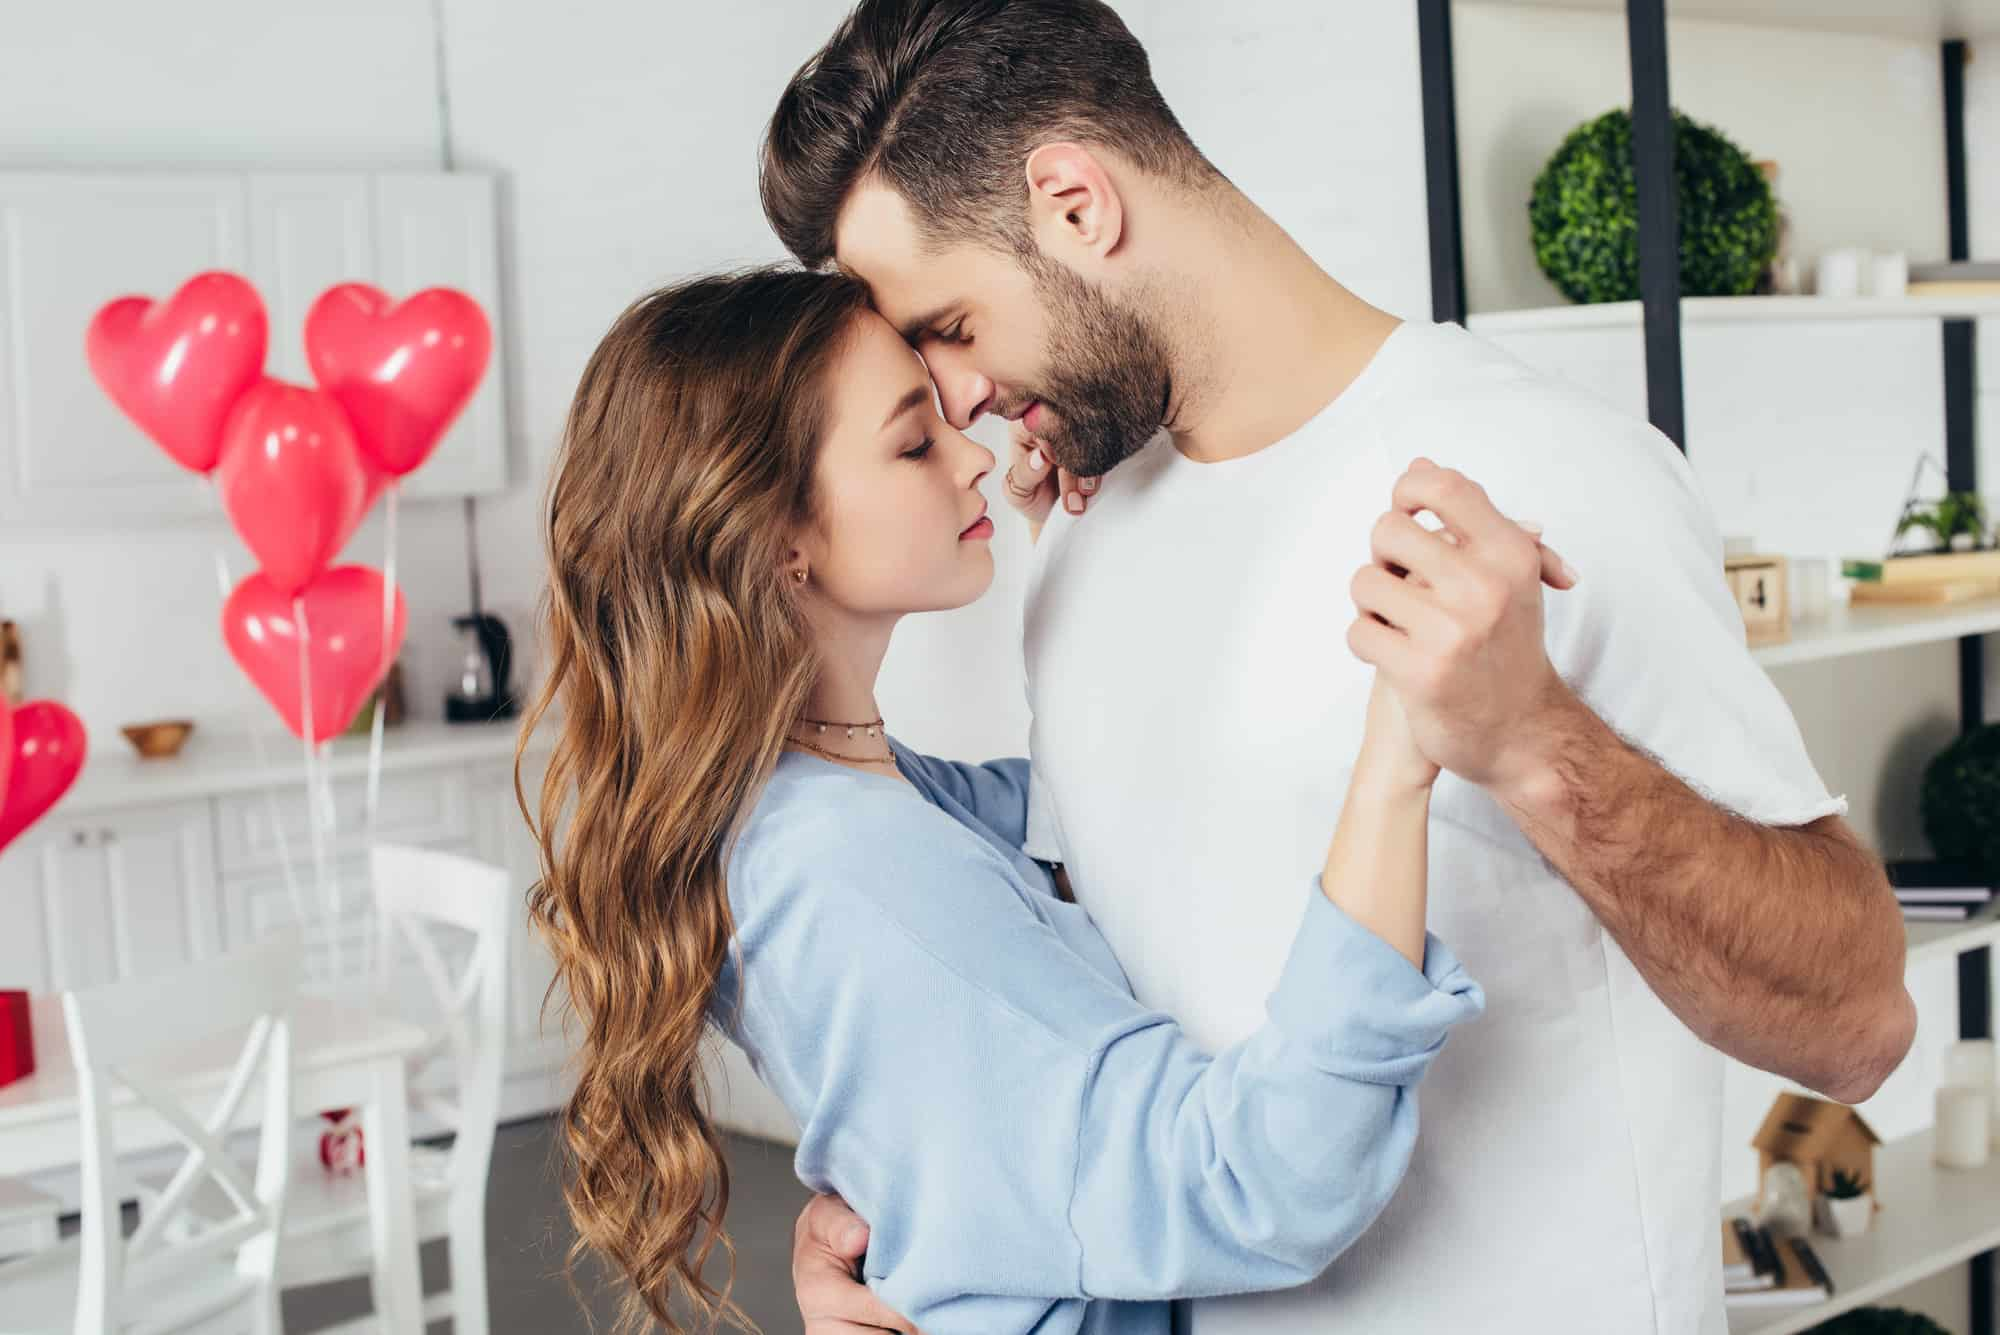 How To Make Aquarius Man Fall In Love With Scorpio Woman